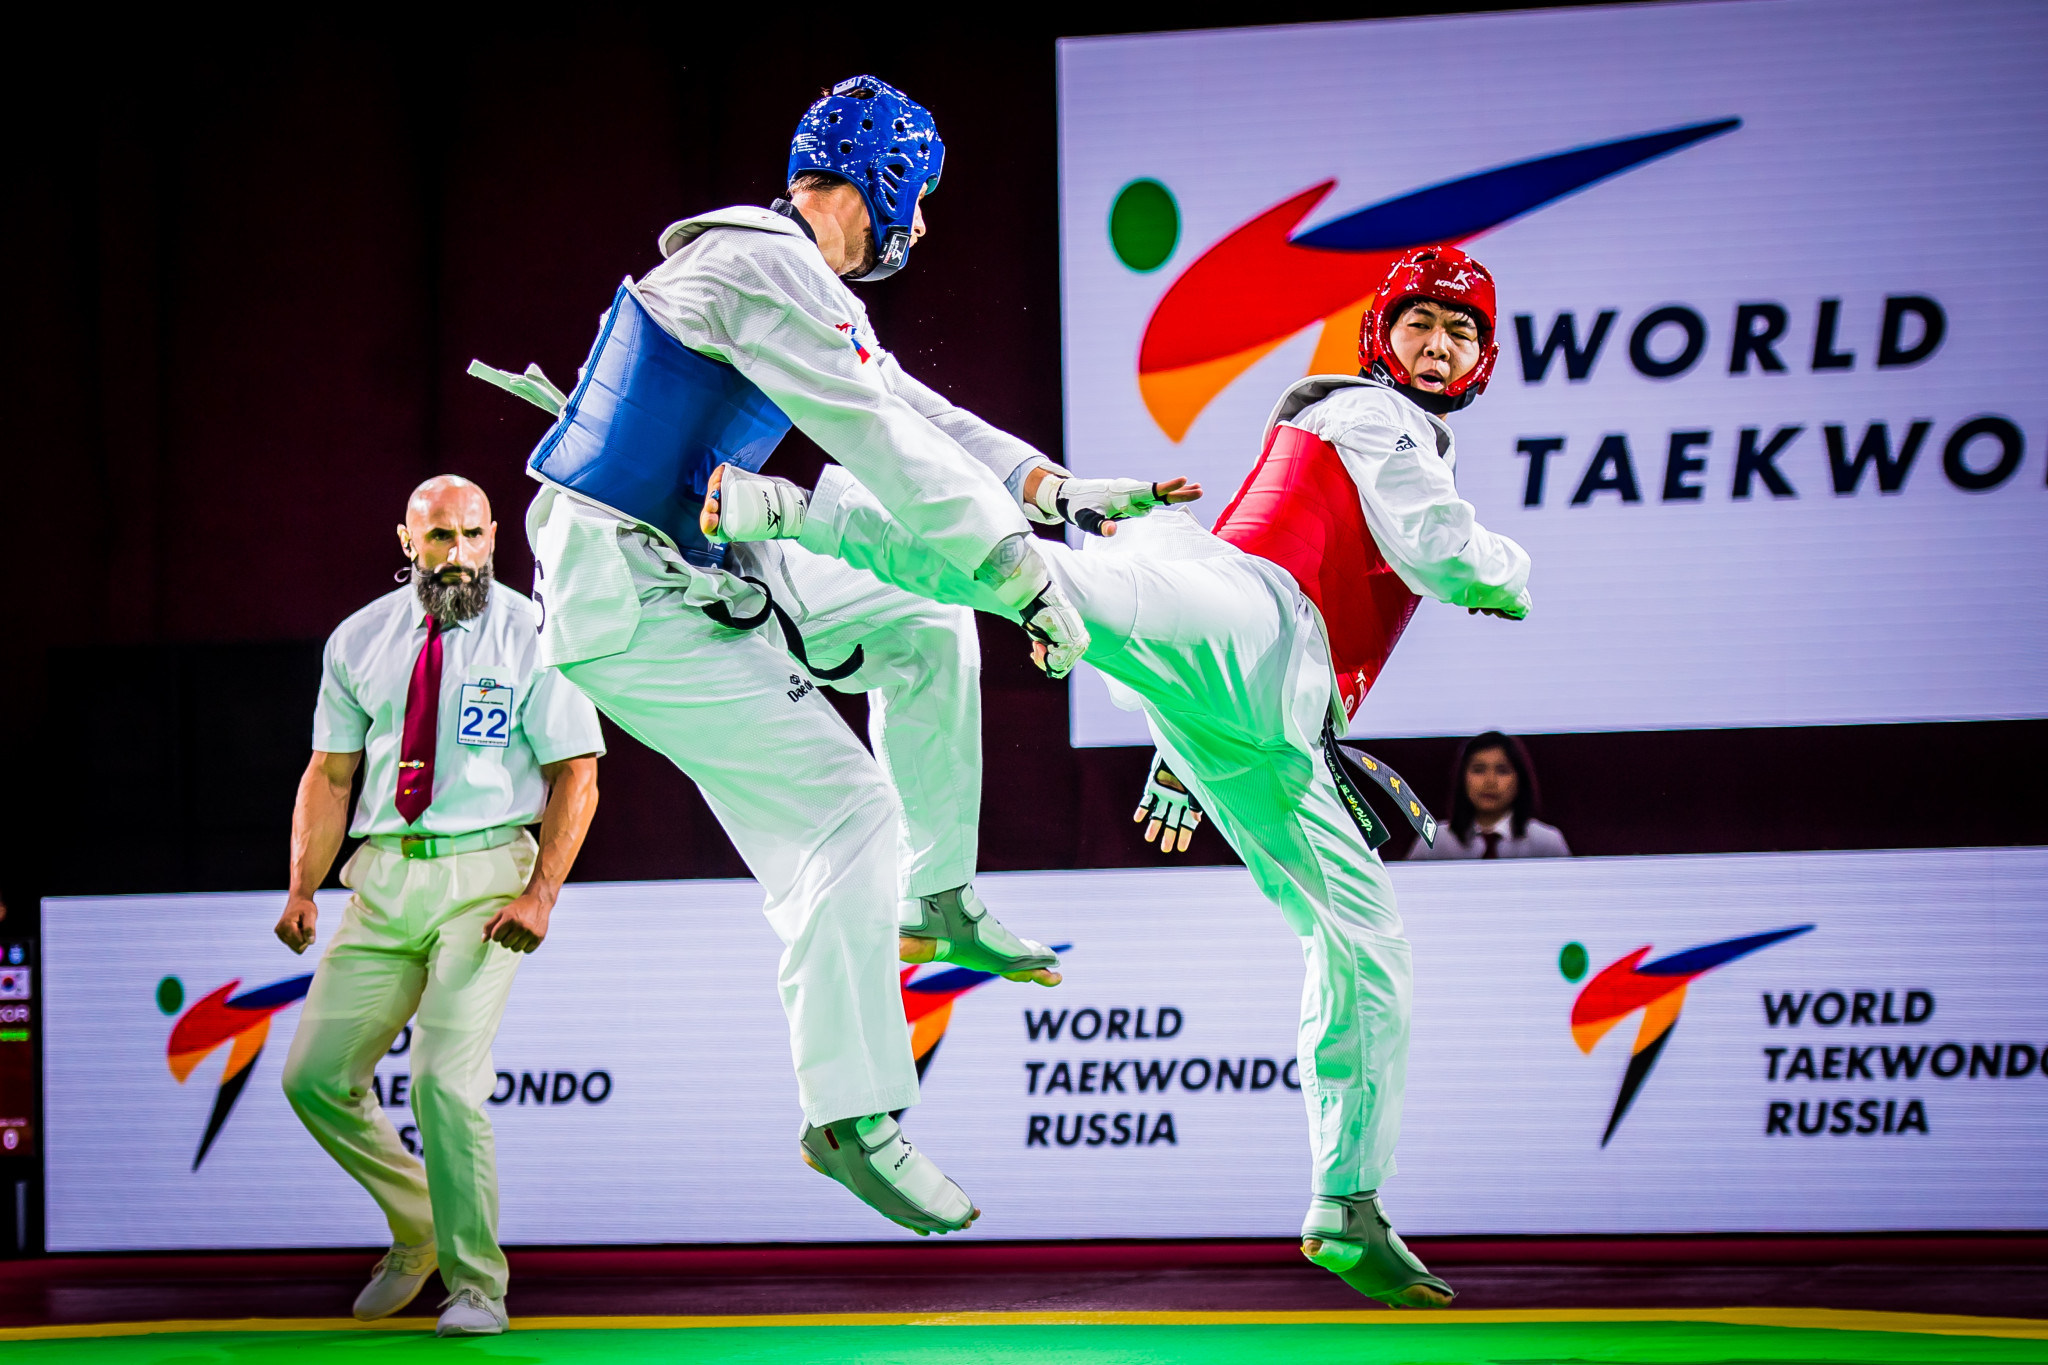 South Korea's In Kyo-don defeated Slovenia's Ivan Konrad Trajkovic in the men's over-80kg gold medal match ©World Taekwondo